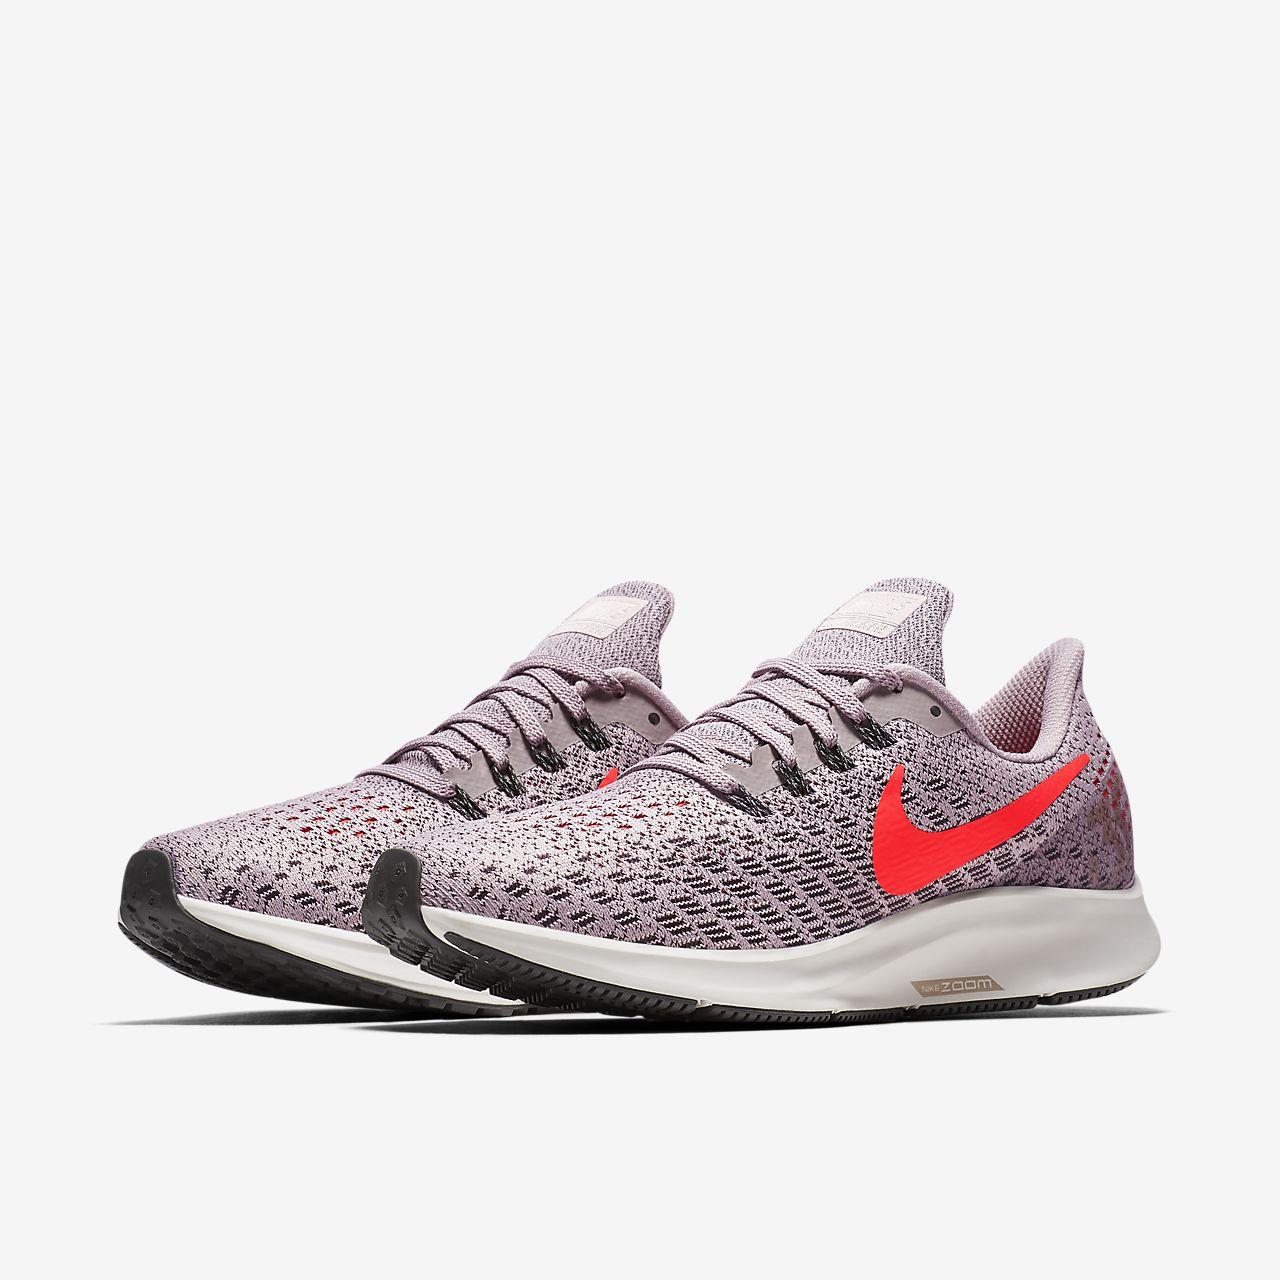 the best attitude 6892b 3c7f7 ... Nike Air Zoom Pegasus 35 Women s Running Shoe